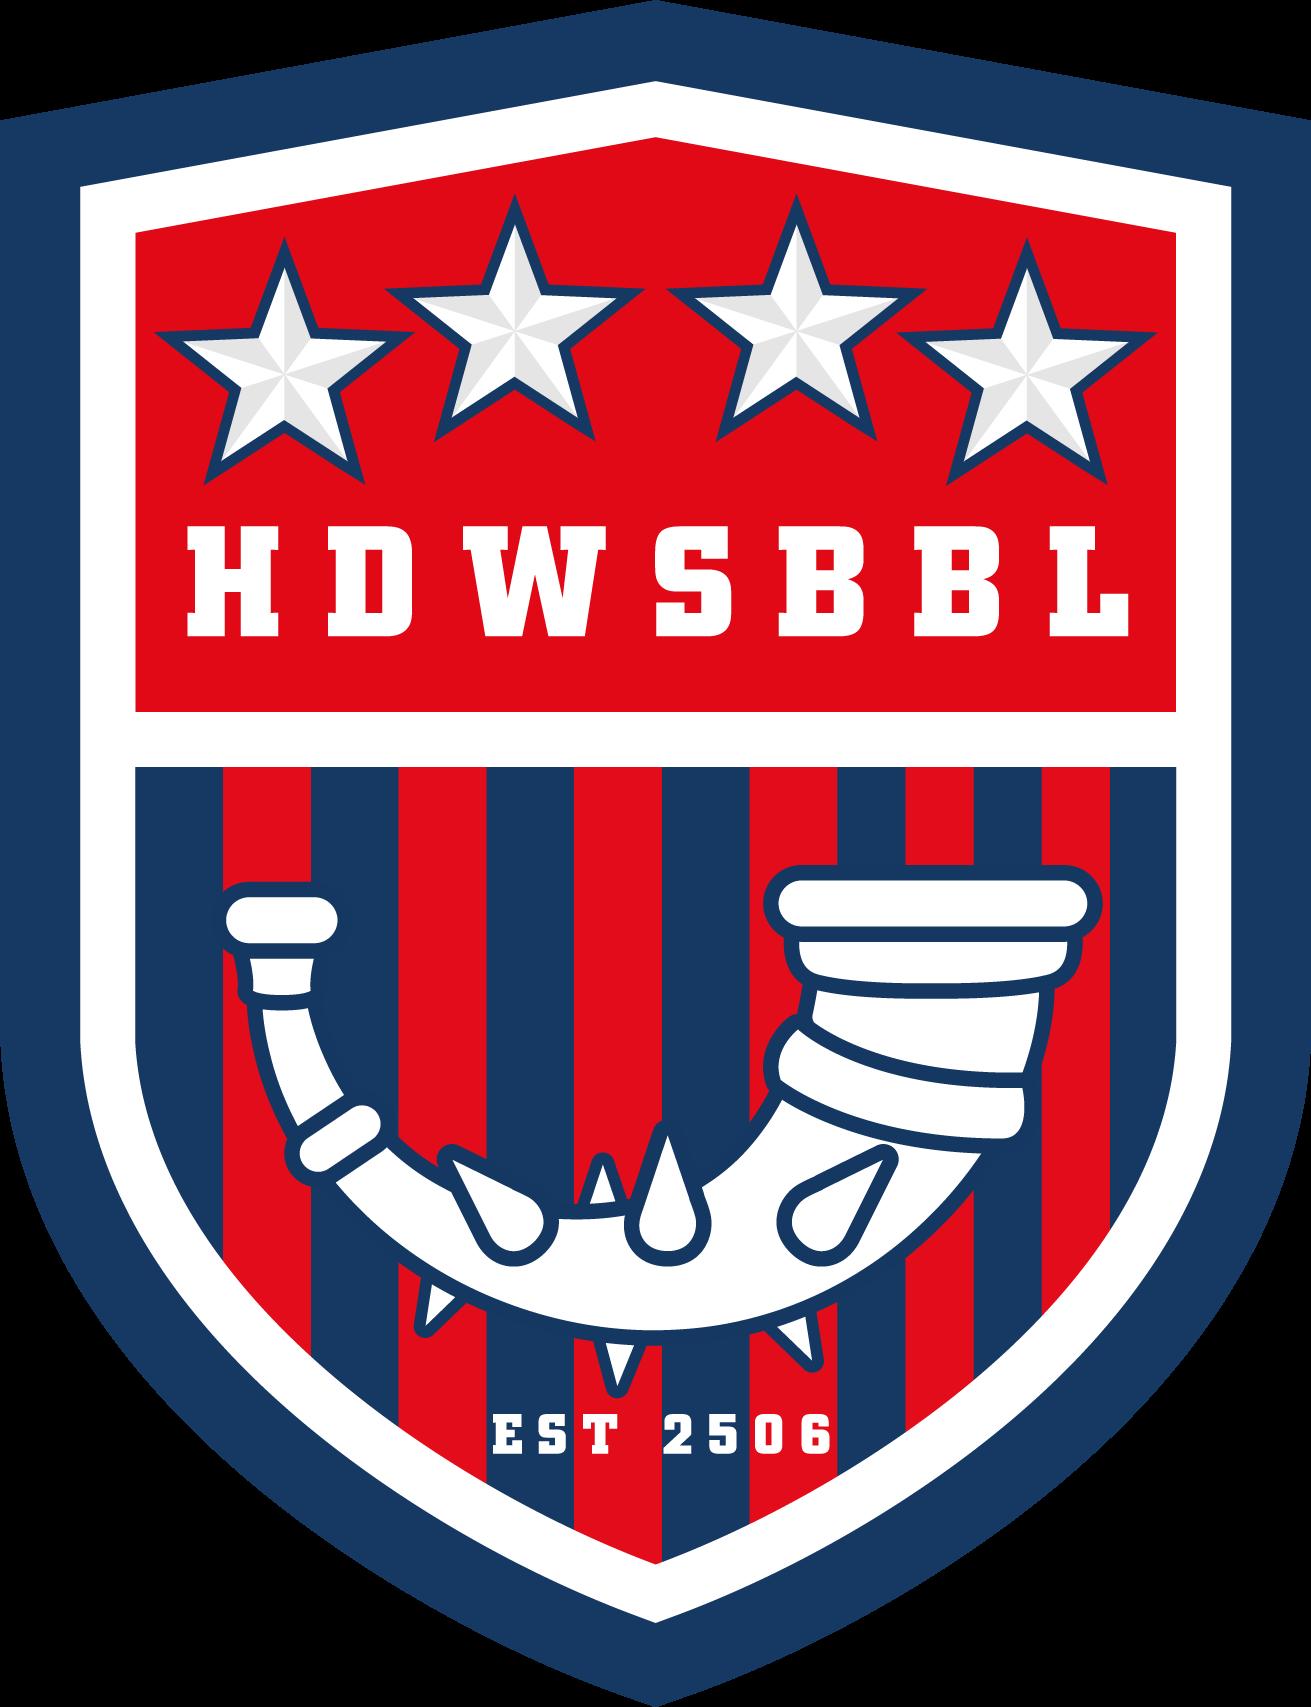 HDWSBBL Online